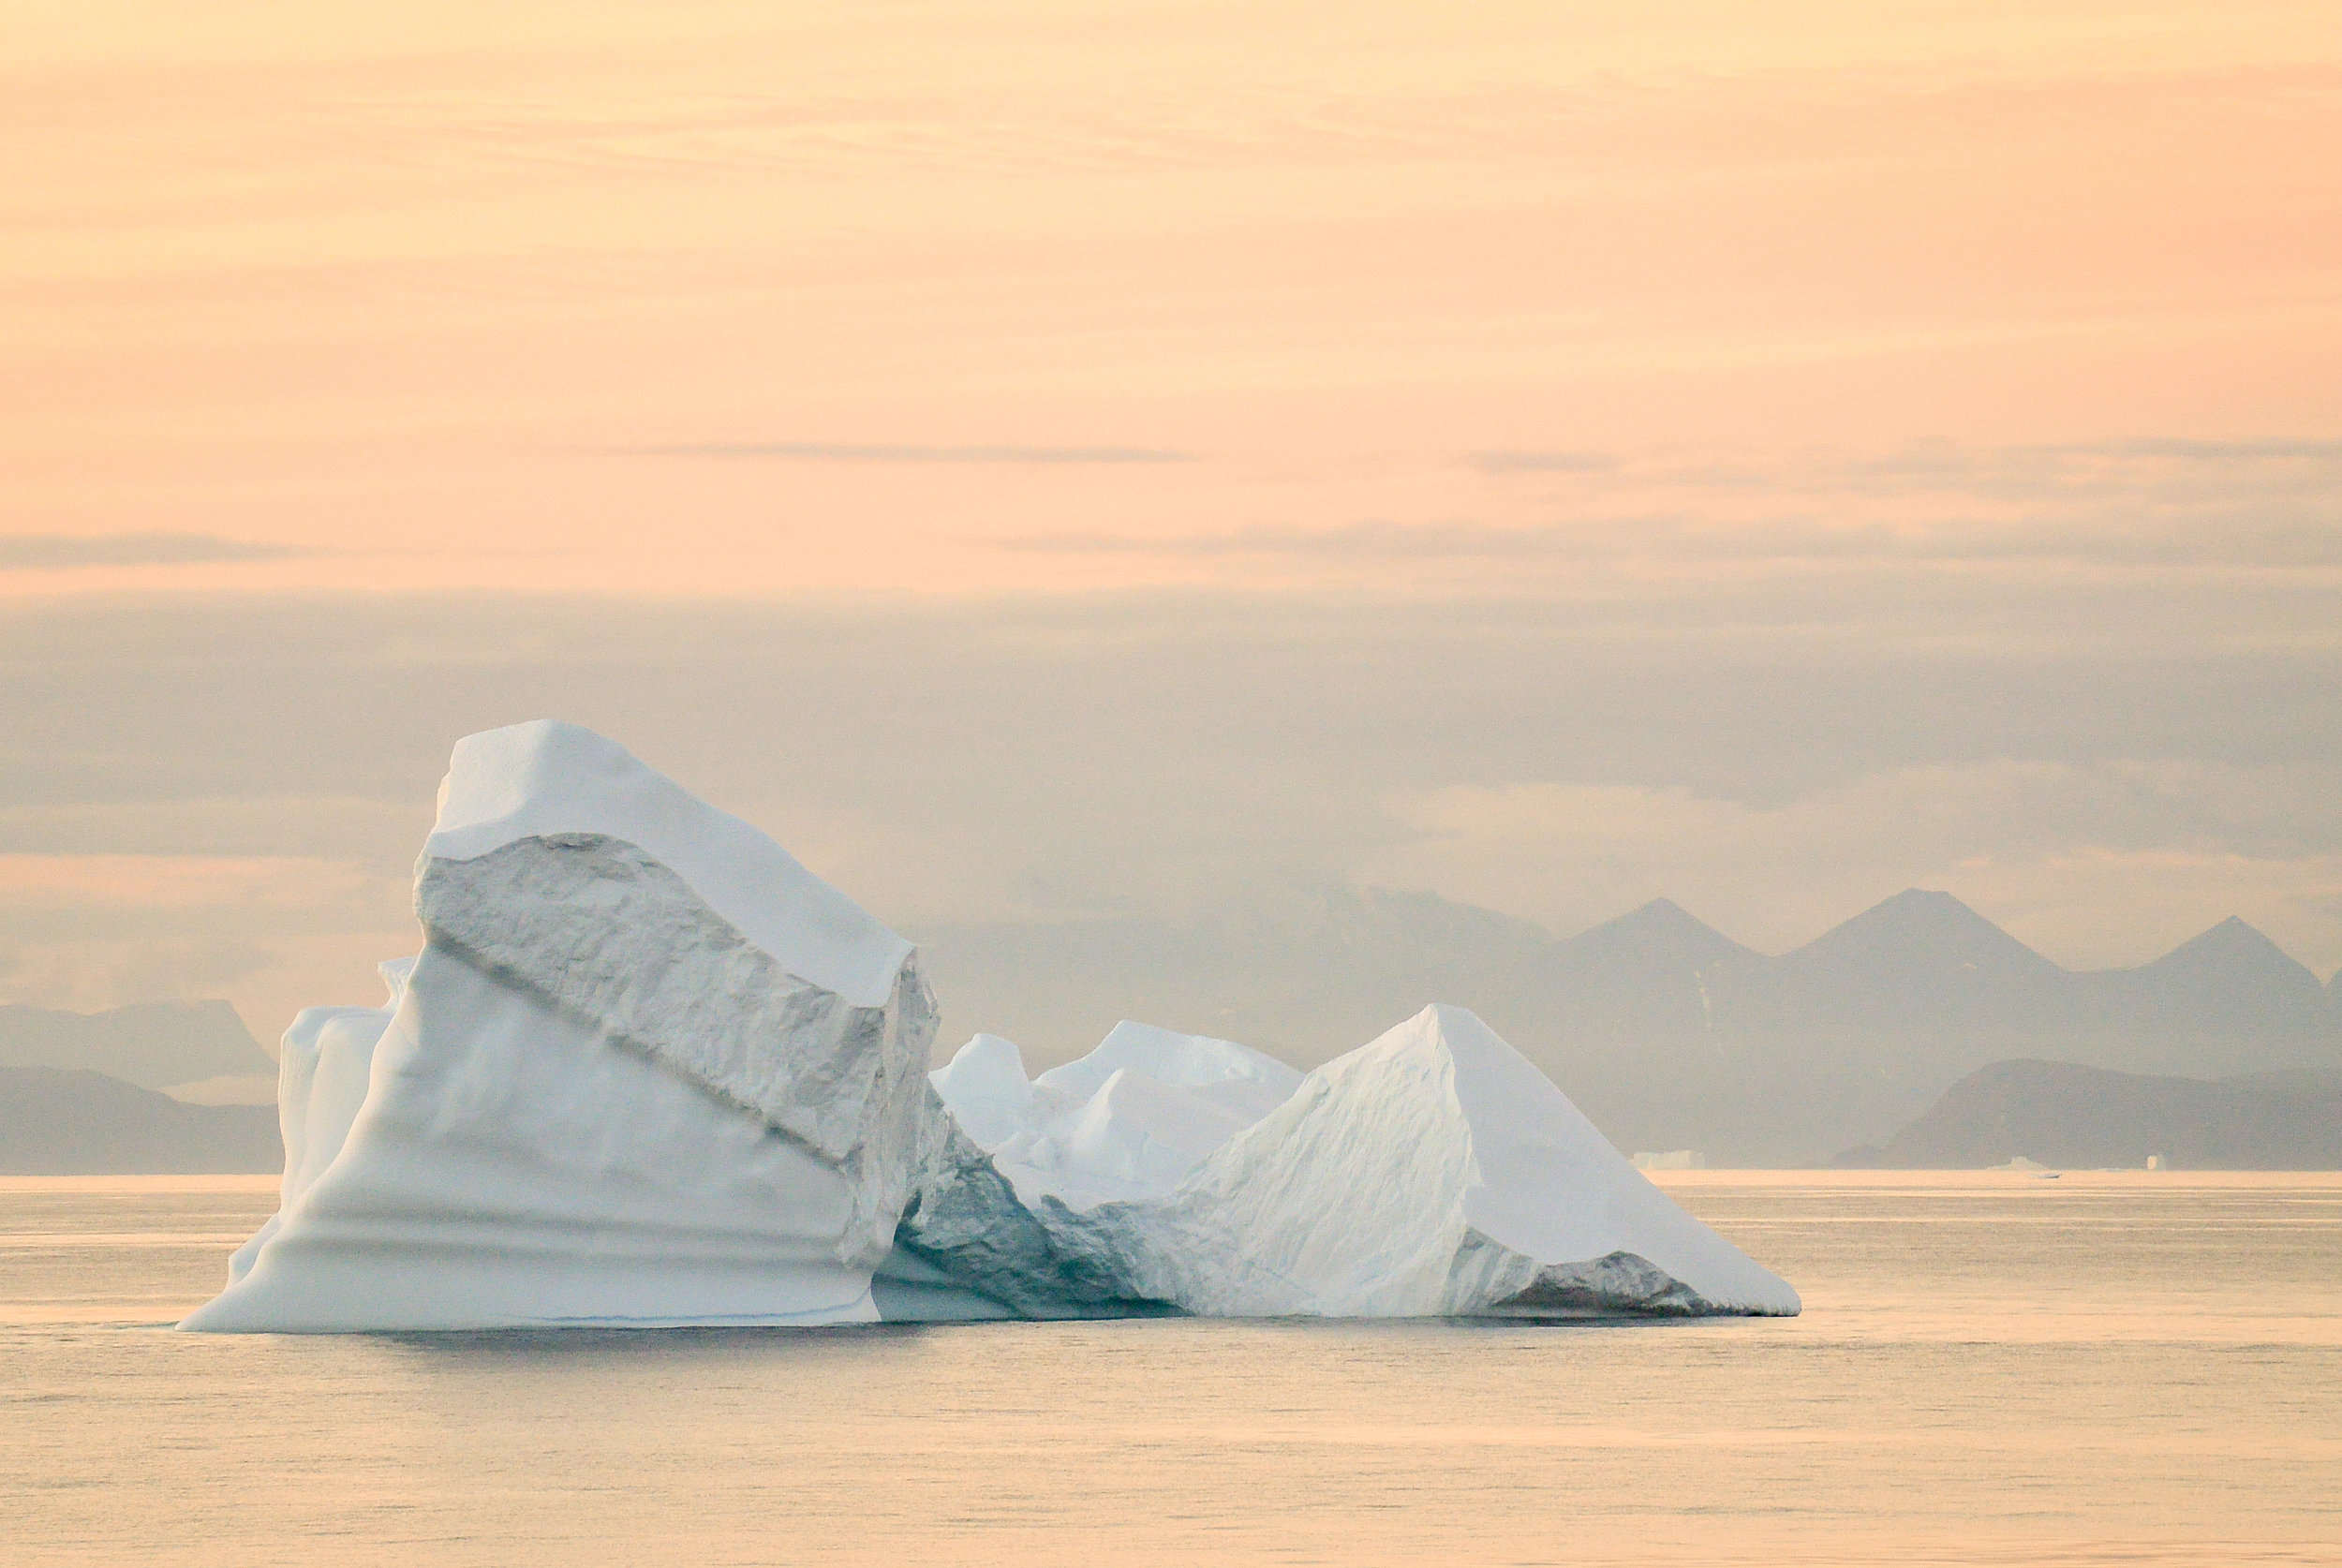 Giant iceberg at sunset